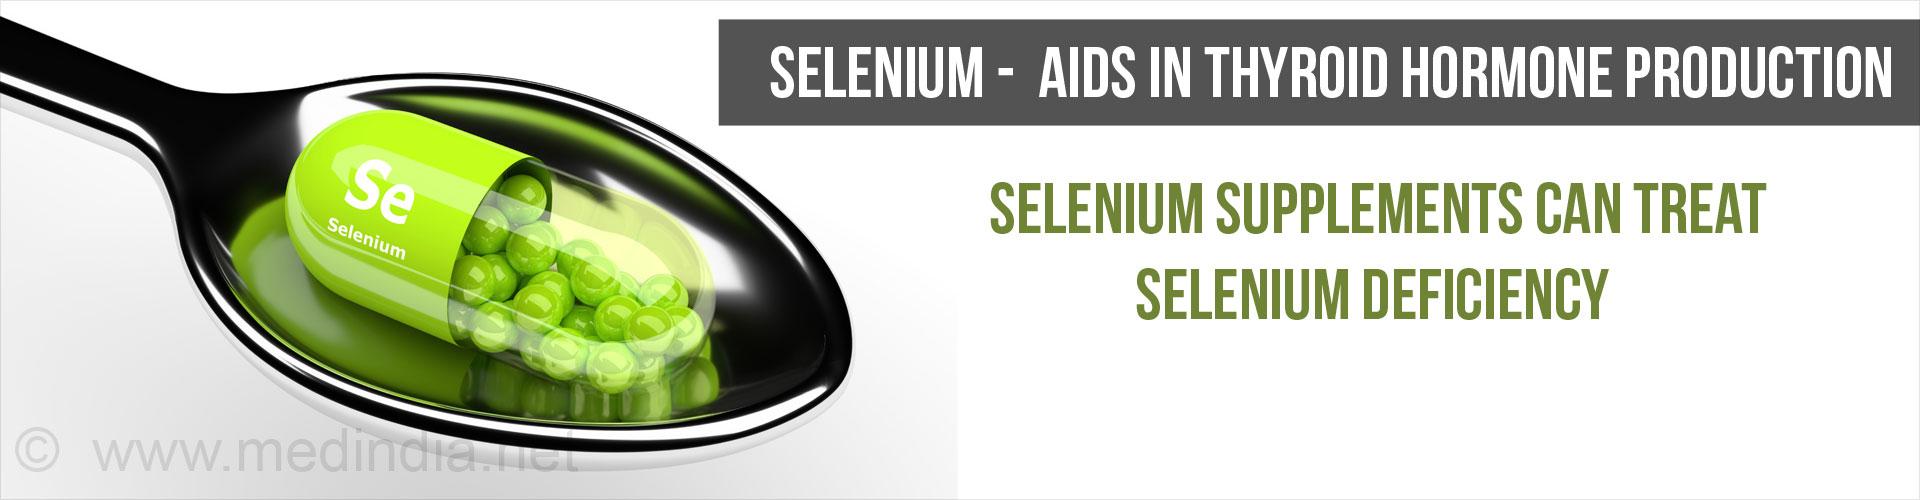 Selenium - Aids In Thyroid Hormone Production Selenium supplements can treat selenium defeciency